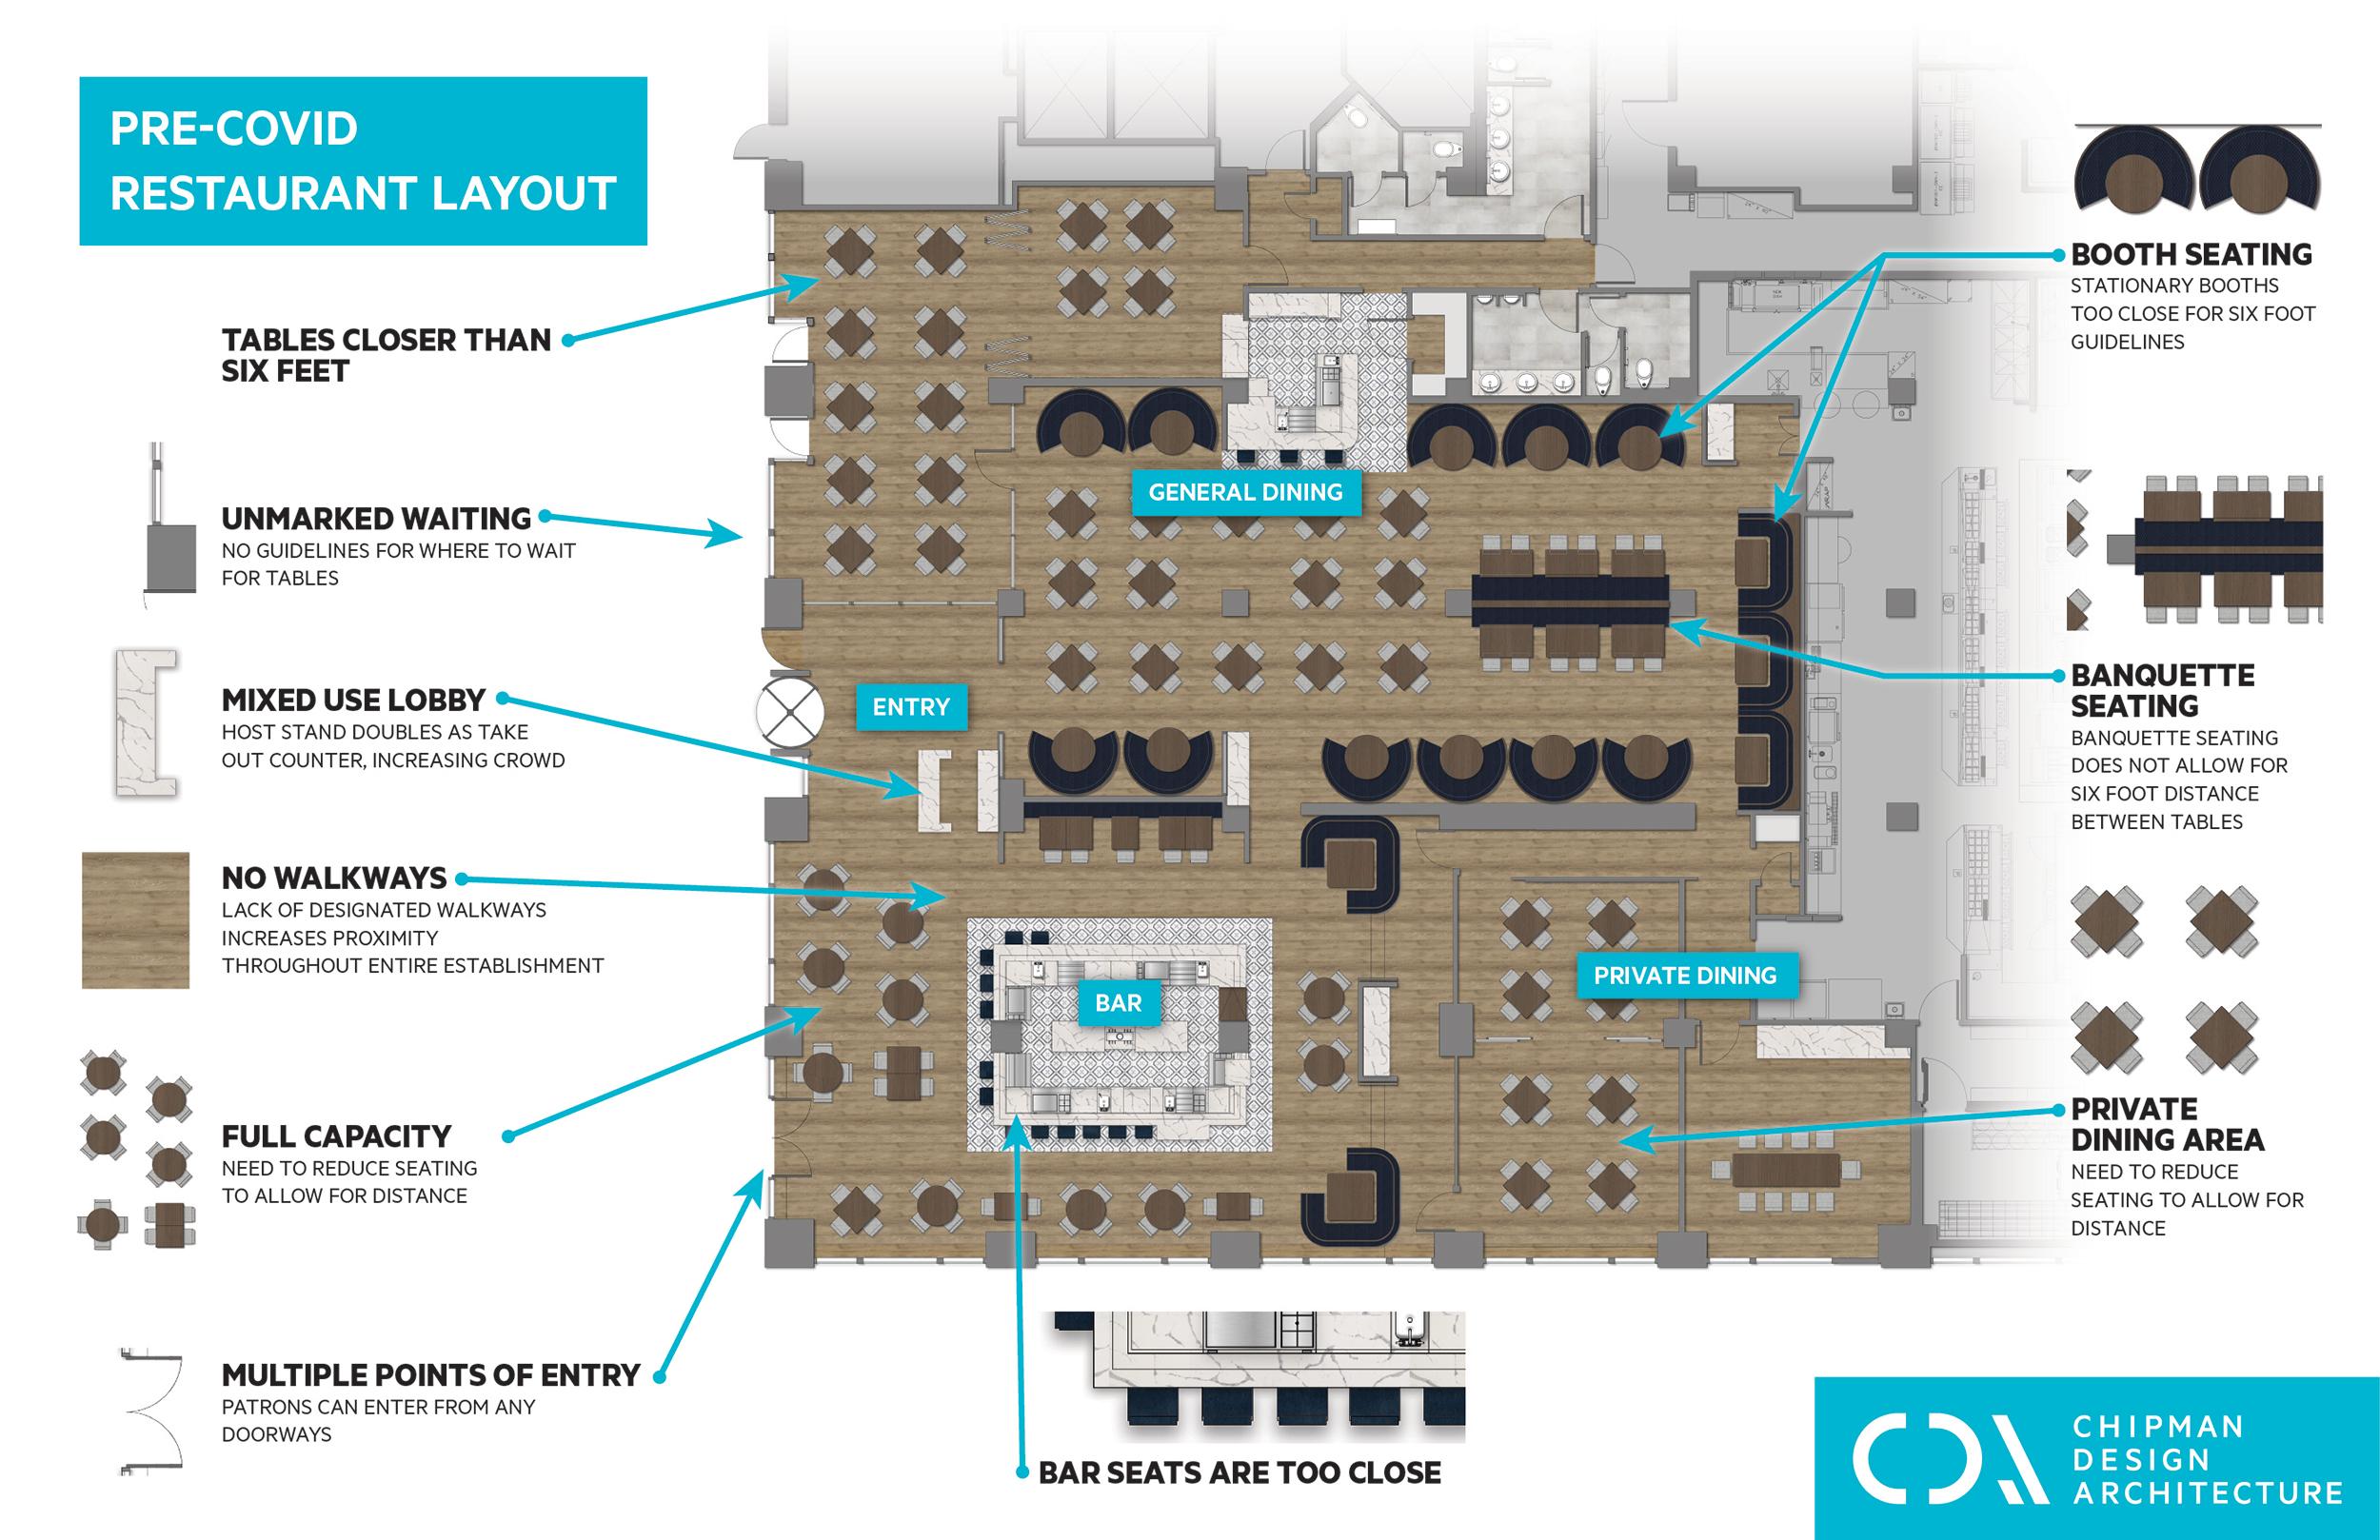 pre-covid restaurant layout by chipman design architecture